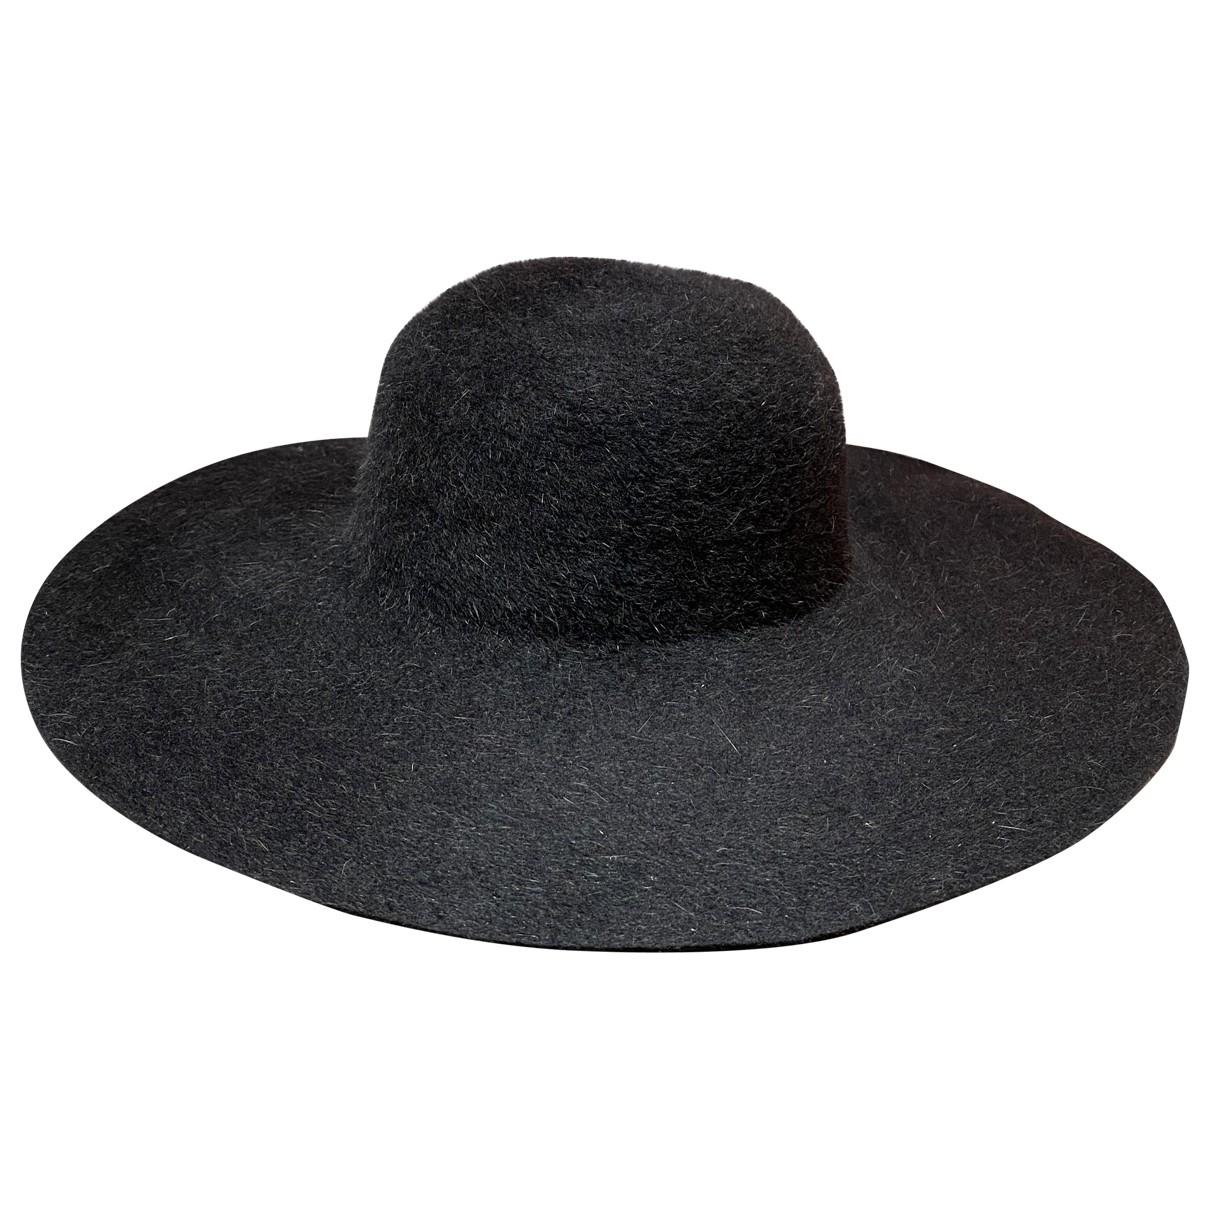 Tophop \N Hut in  Schwarz Wolle